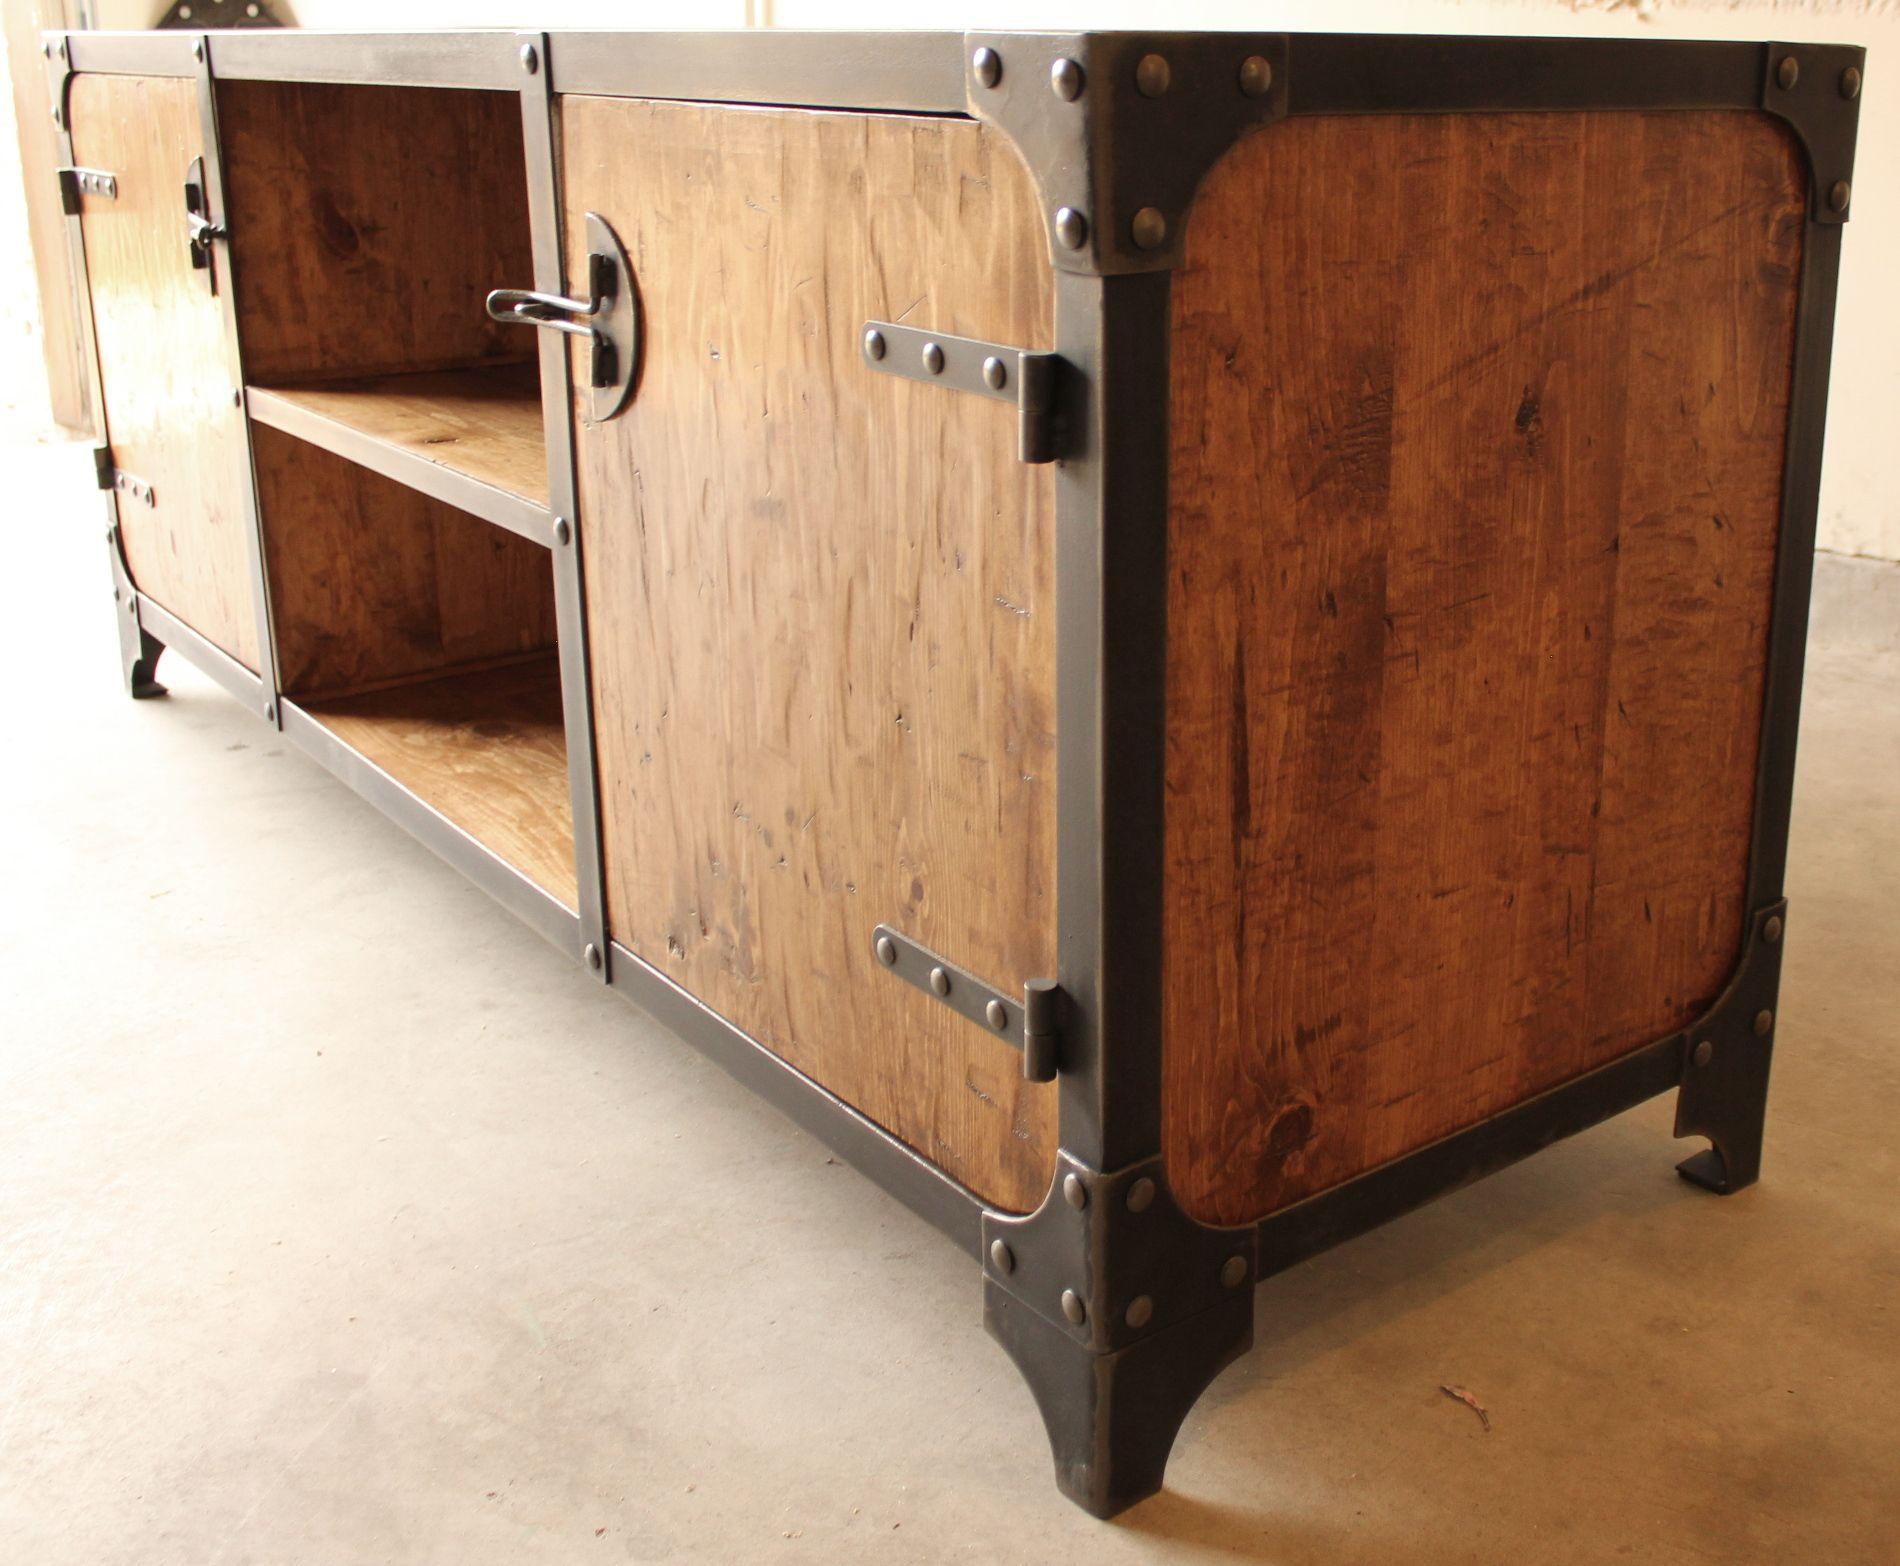 Credenza Rustica Vintage : Handmade industrial media console buffet or credenza wood iron